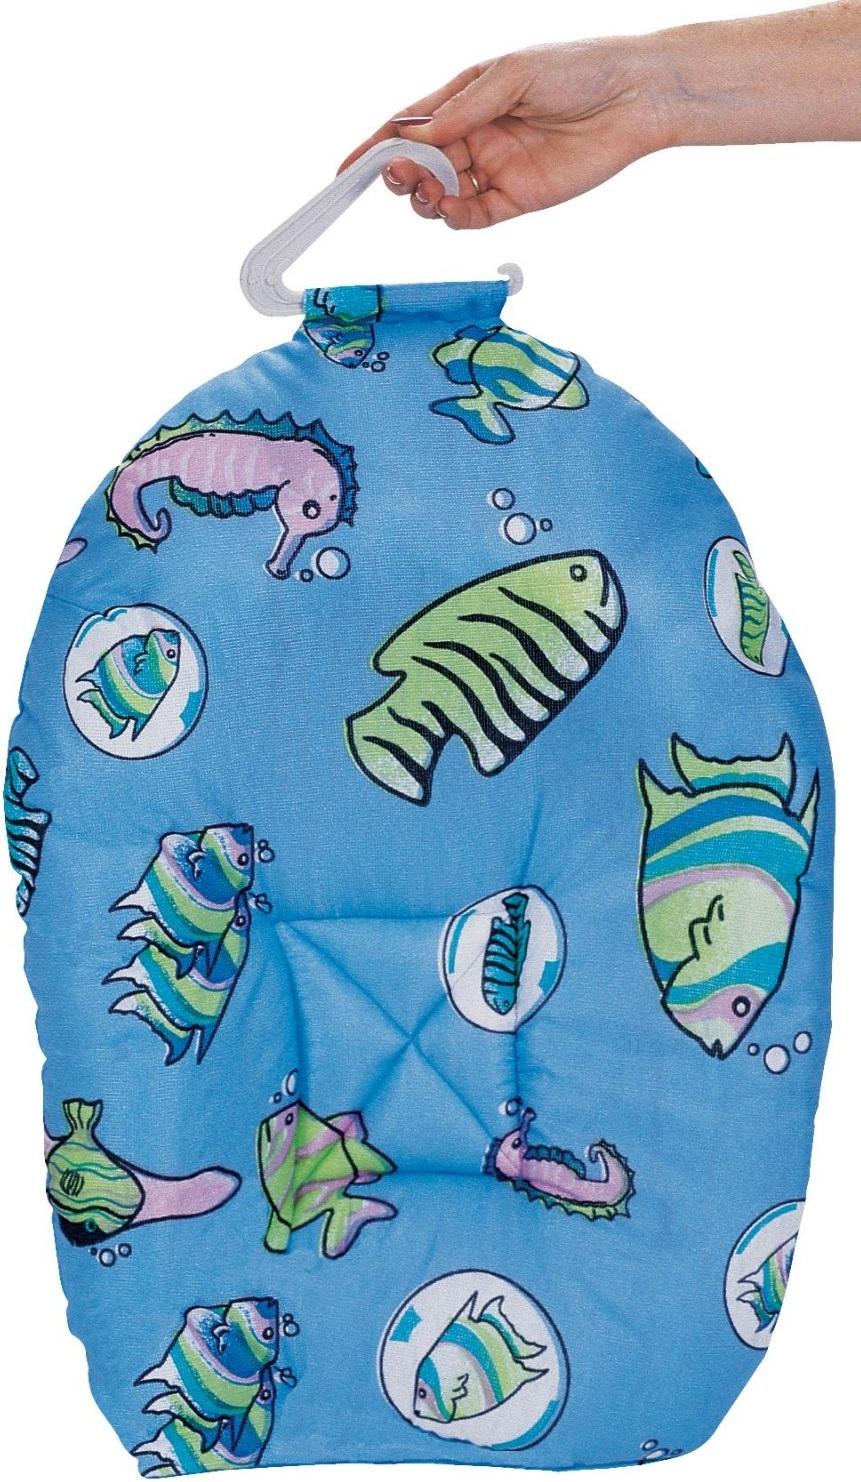 Leachco Safer Bather Infant Bath Pad Blue Fish Baby Cinema